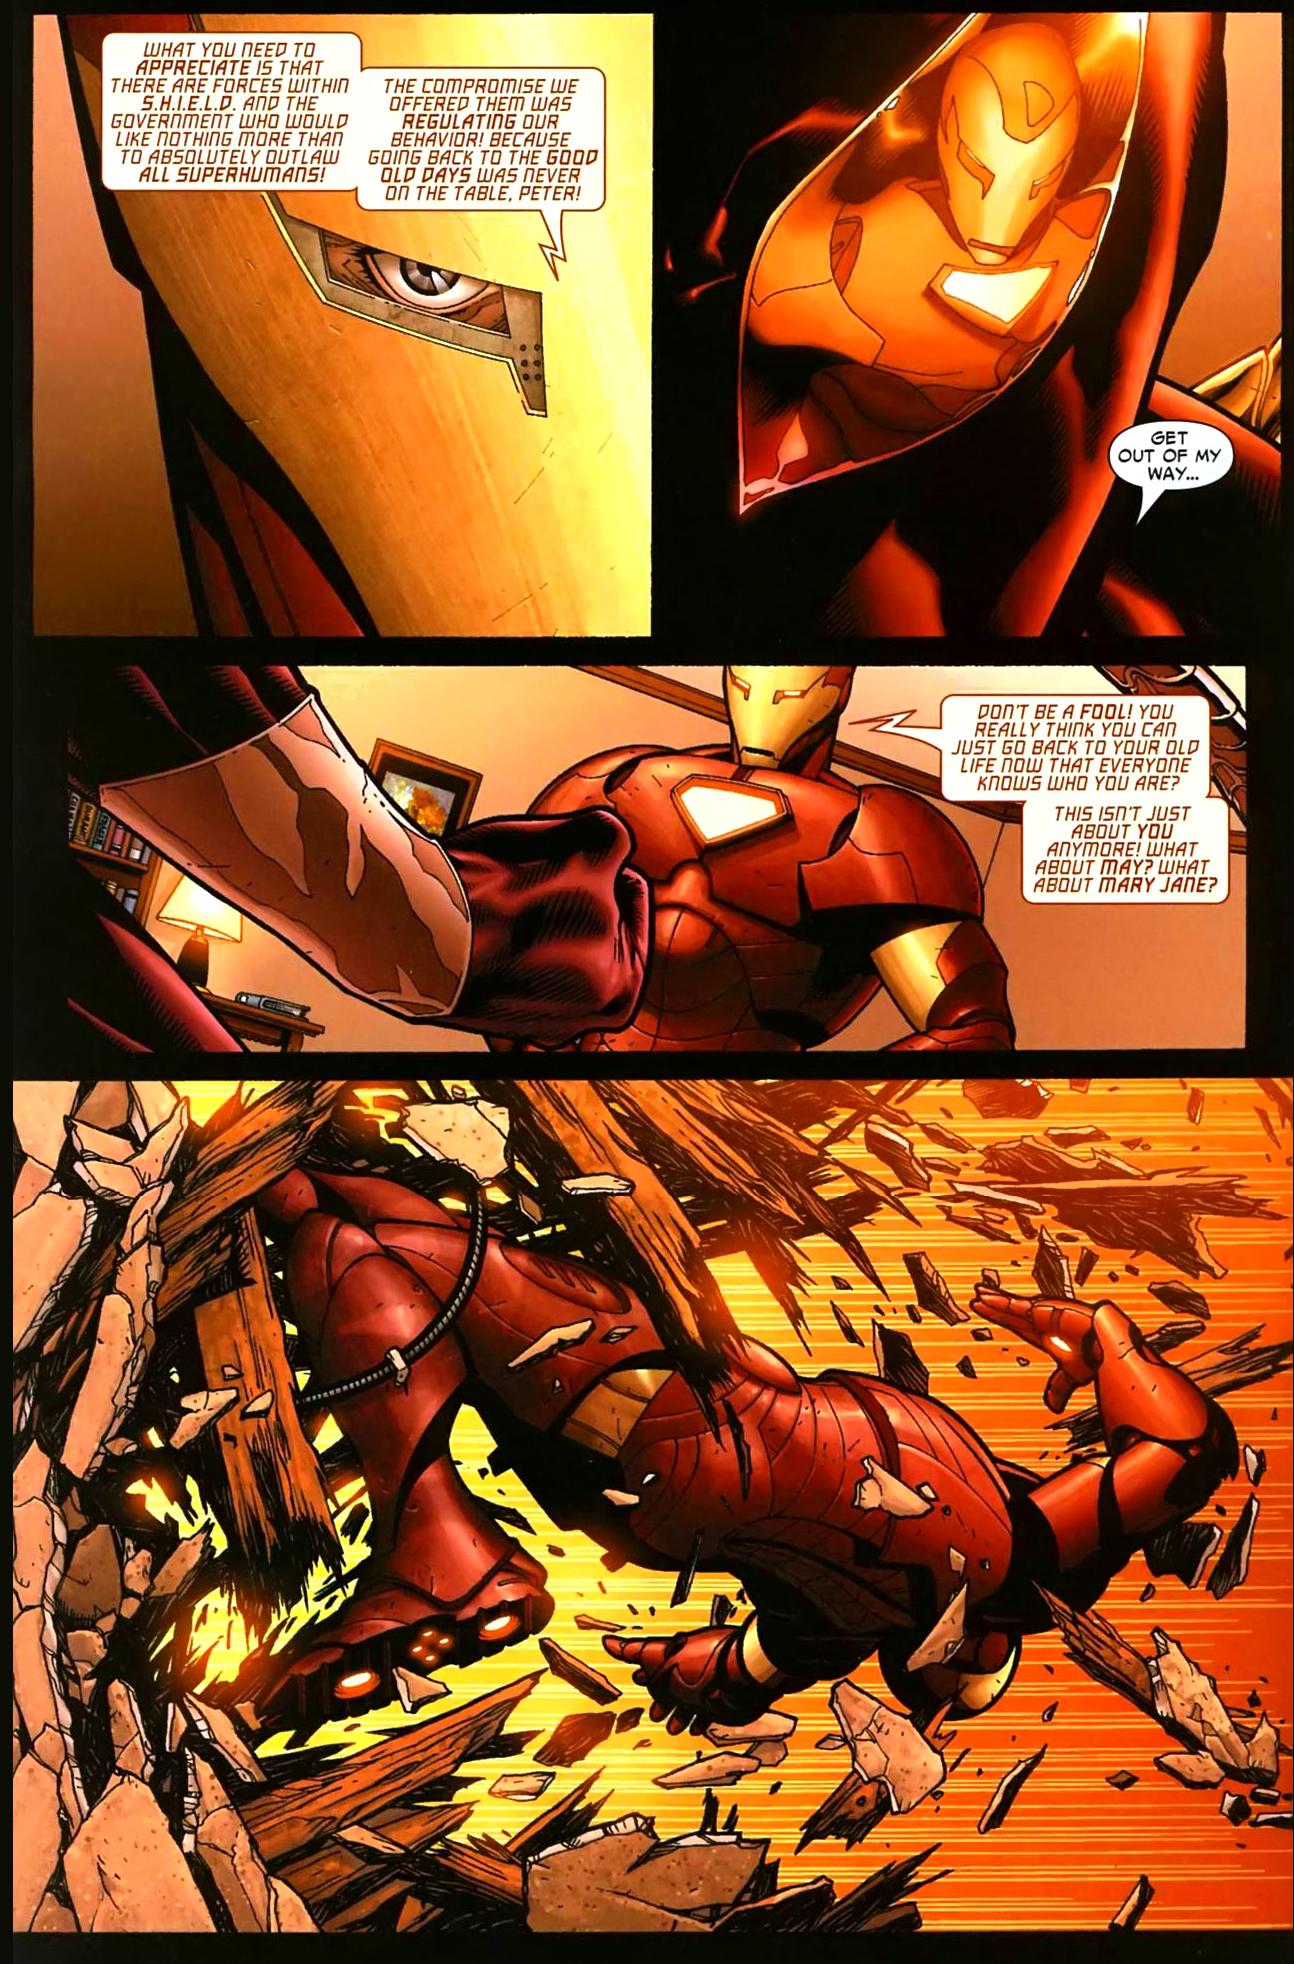 Iron spiderman vs spiderman - photo#4